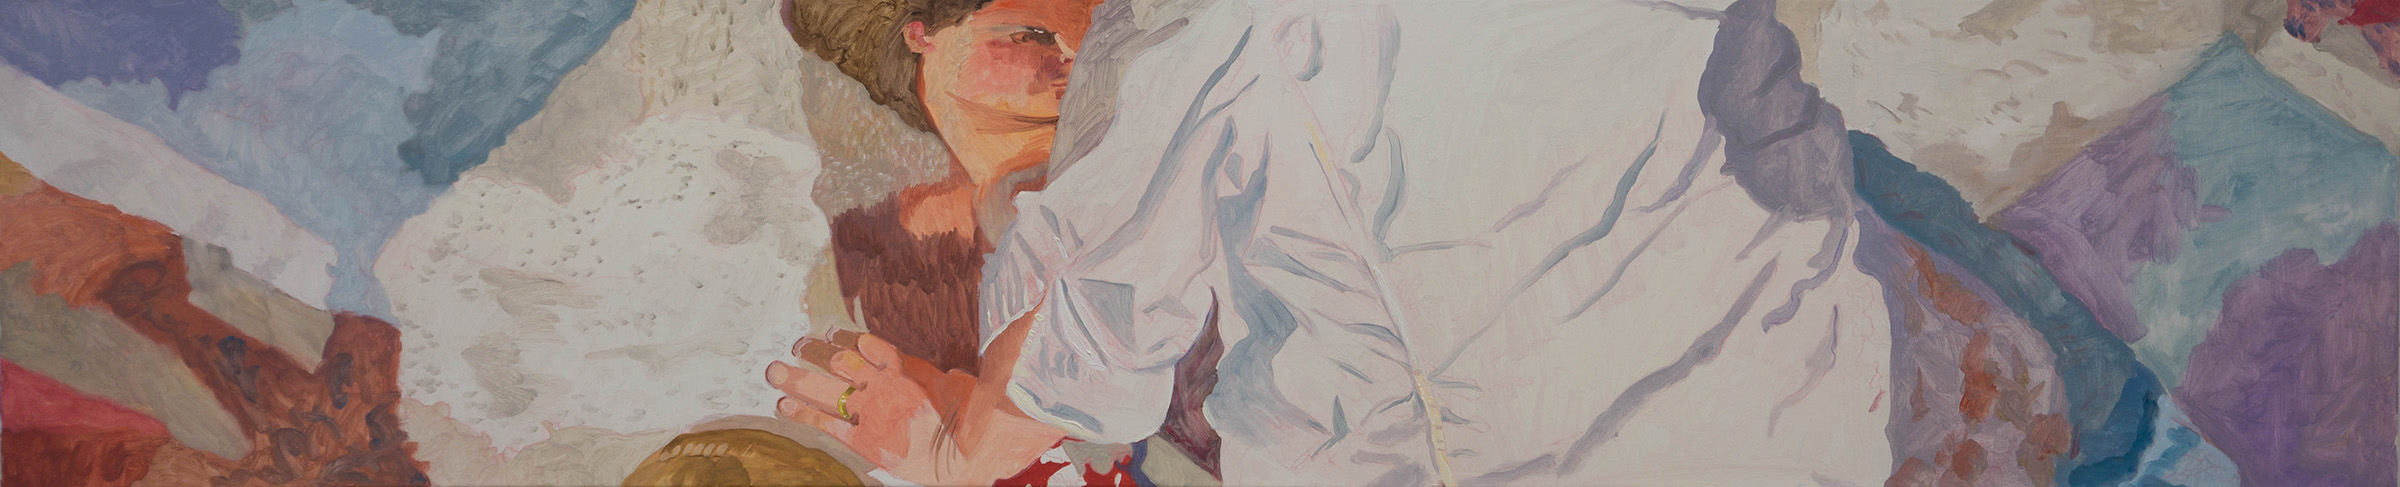 "ANO KATO 40  12x60"" oil on portrait linen  based on photos i shot in 2010 of a sidewalk artist in  denver, co."